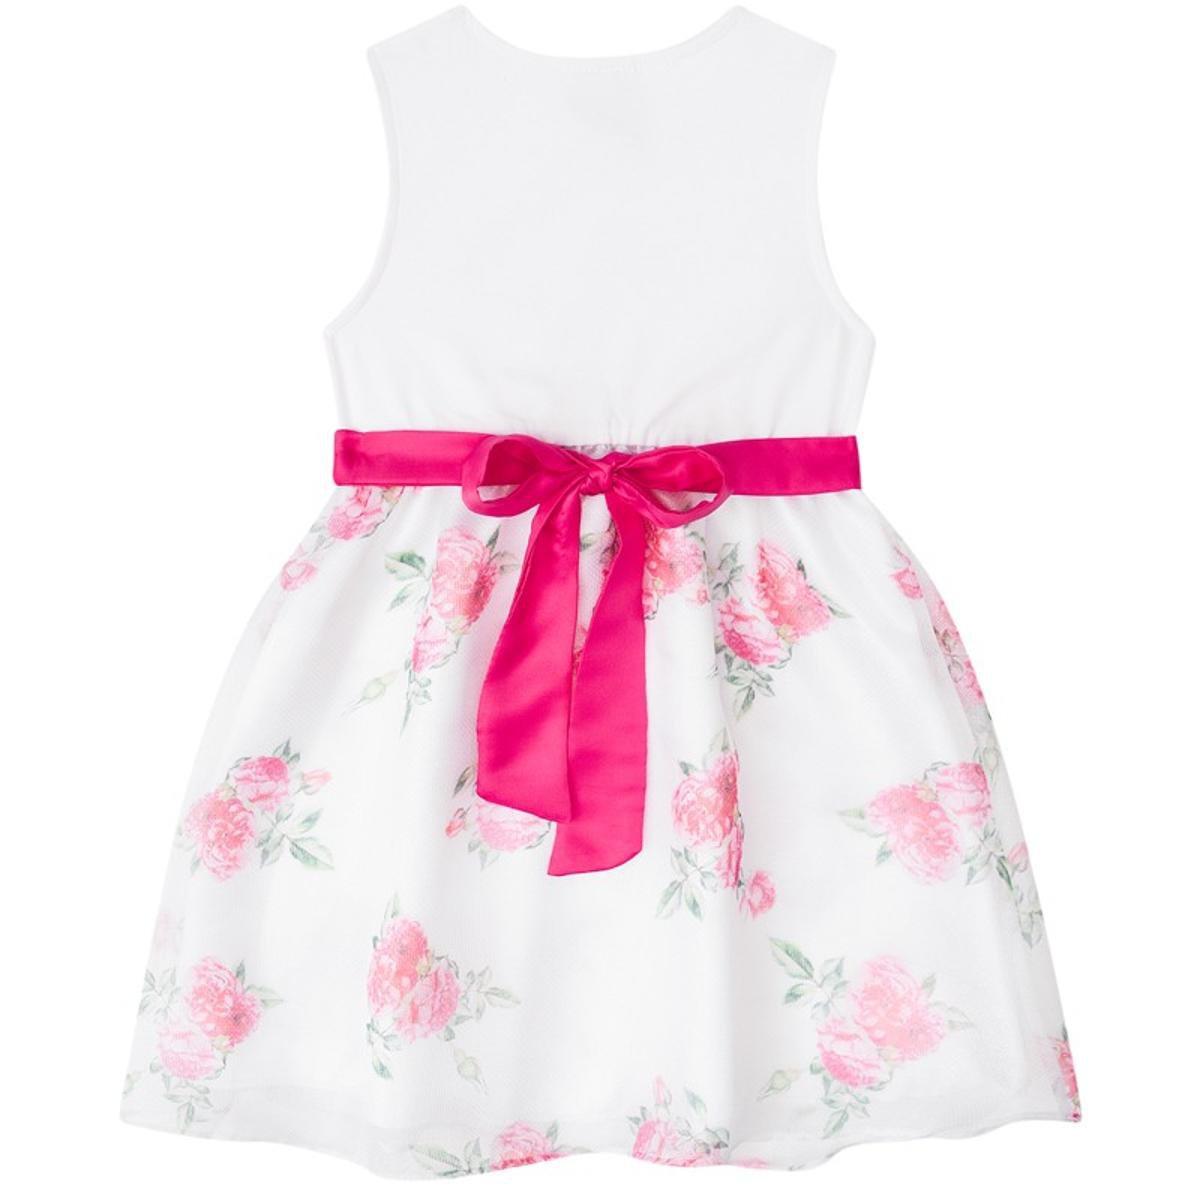 Vestido Infantil Boca Grande Feminino Floral - Branco e Rosa ... 0efb883d1df2c